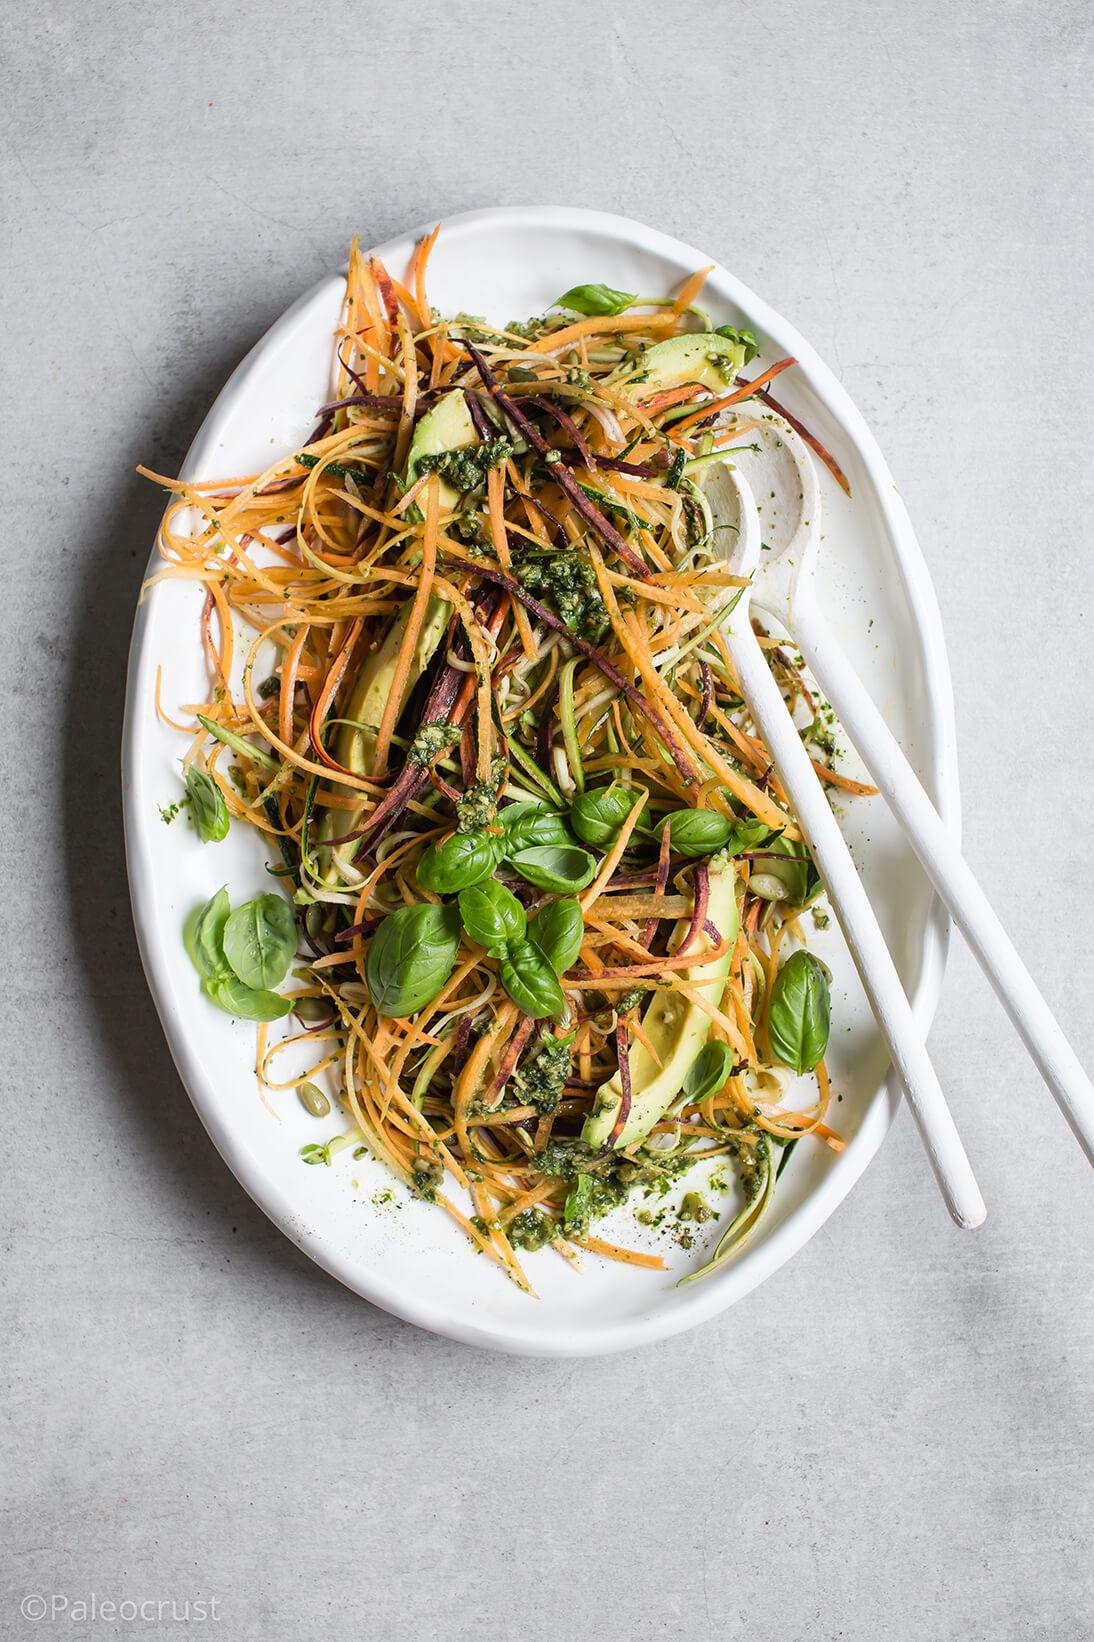 Paleo pasta, Paleo recipes, Raw pasta salad, raw pumpkin seed pesto, Vegan pumpkin seed pesto, dairy free pesto recipe, Paleo Crust, Salad recipes, Whole30 salad, i quit sugar, keto,